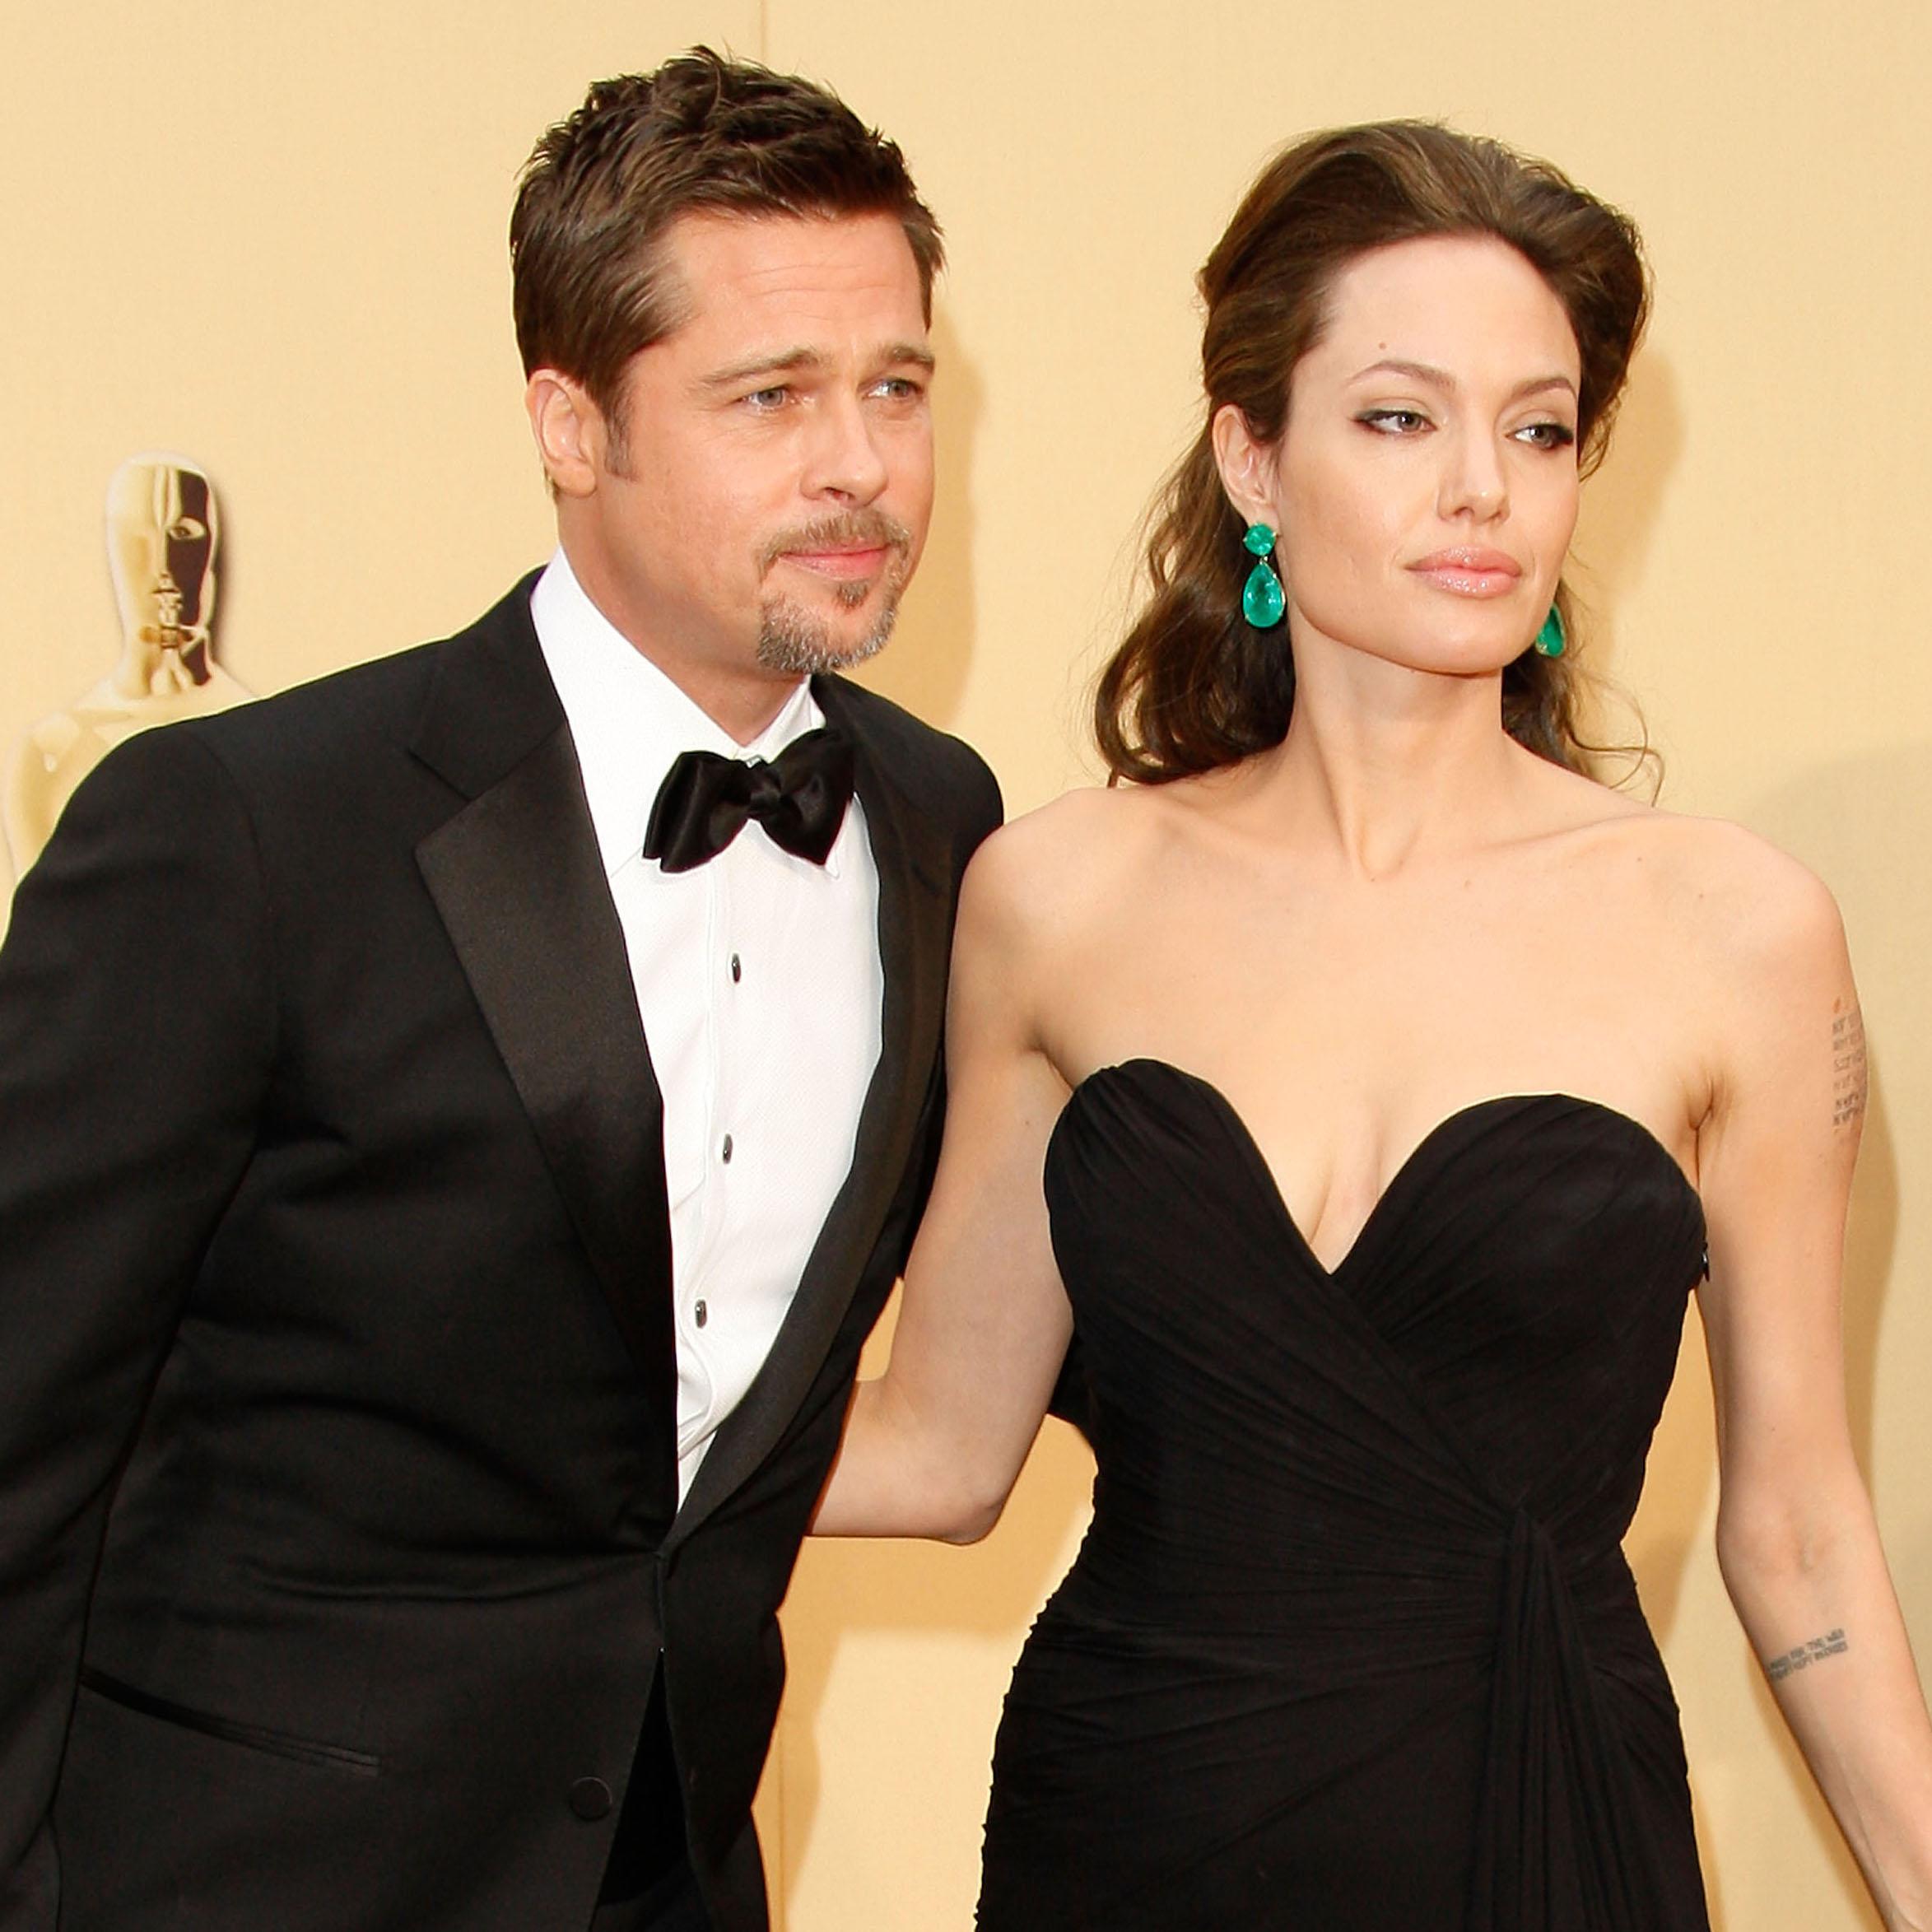 Angelina Jolie Brad Pitt Getty Images